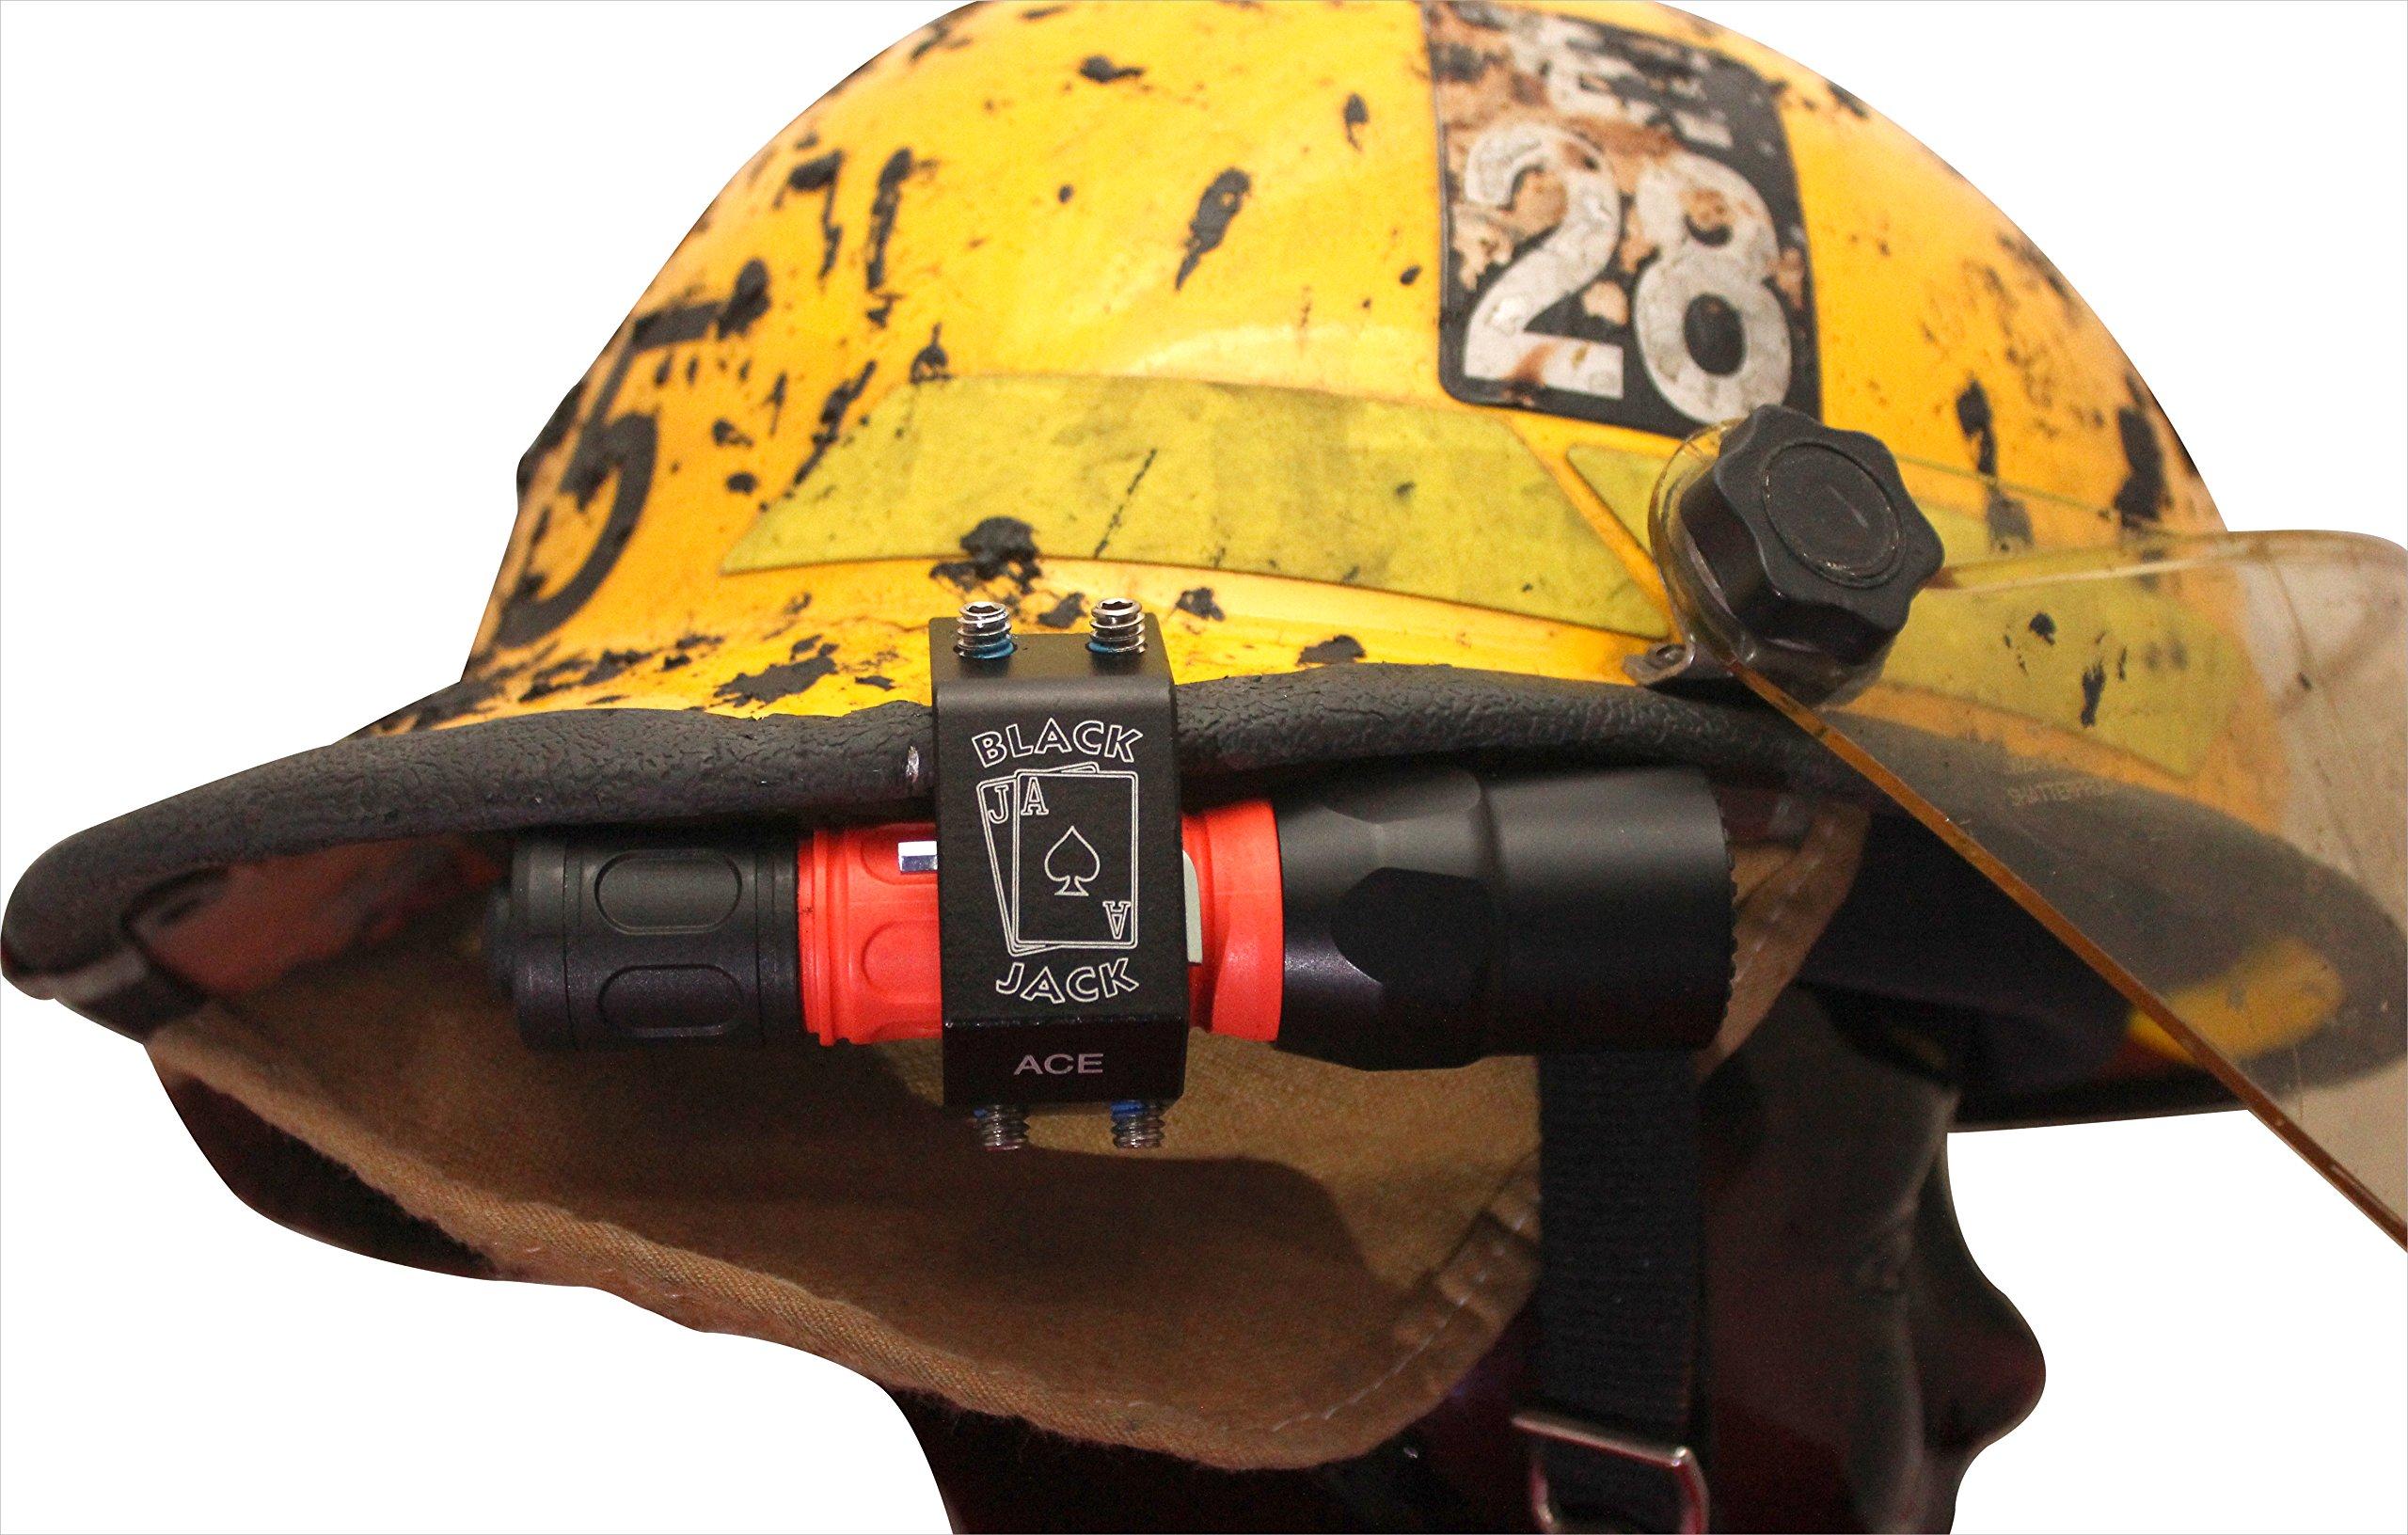 Blackjack ACE Firefighter Helmet Aluminum Flashlight Holder by Blackjack Fire & Safety (Image #4)